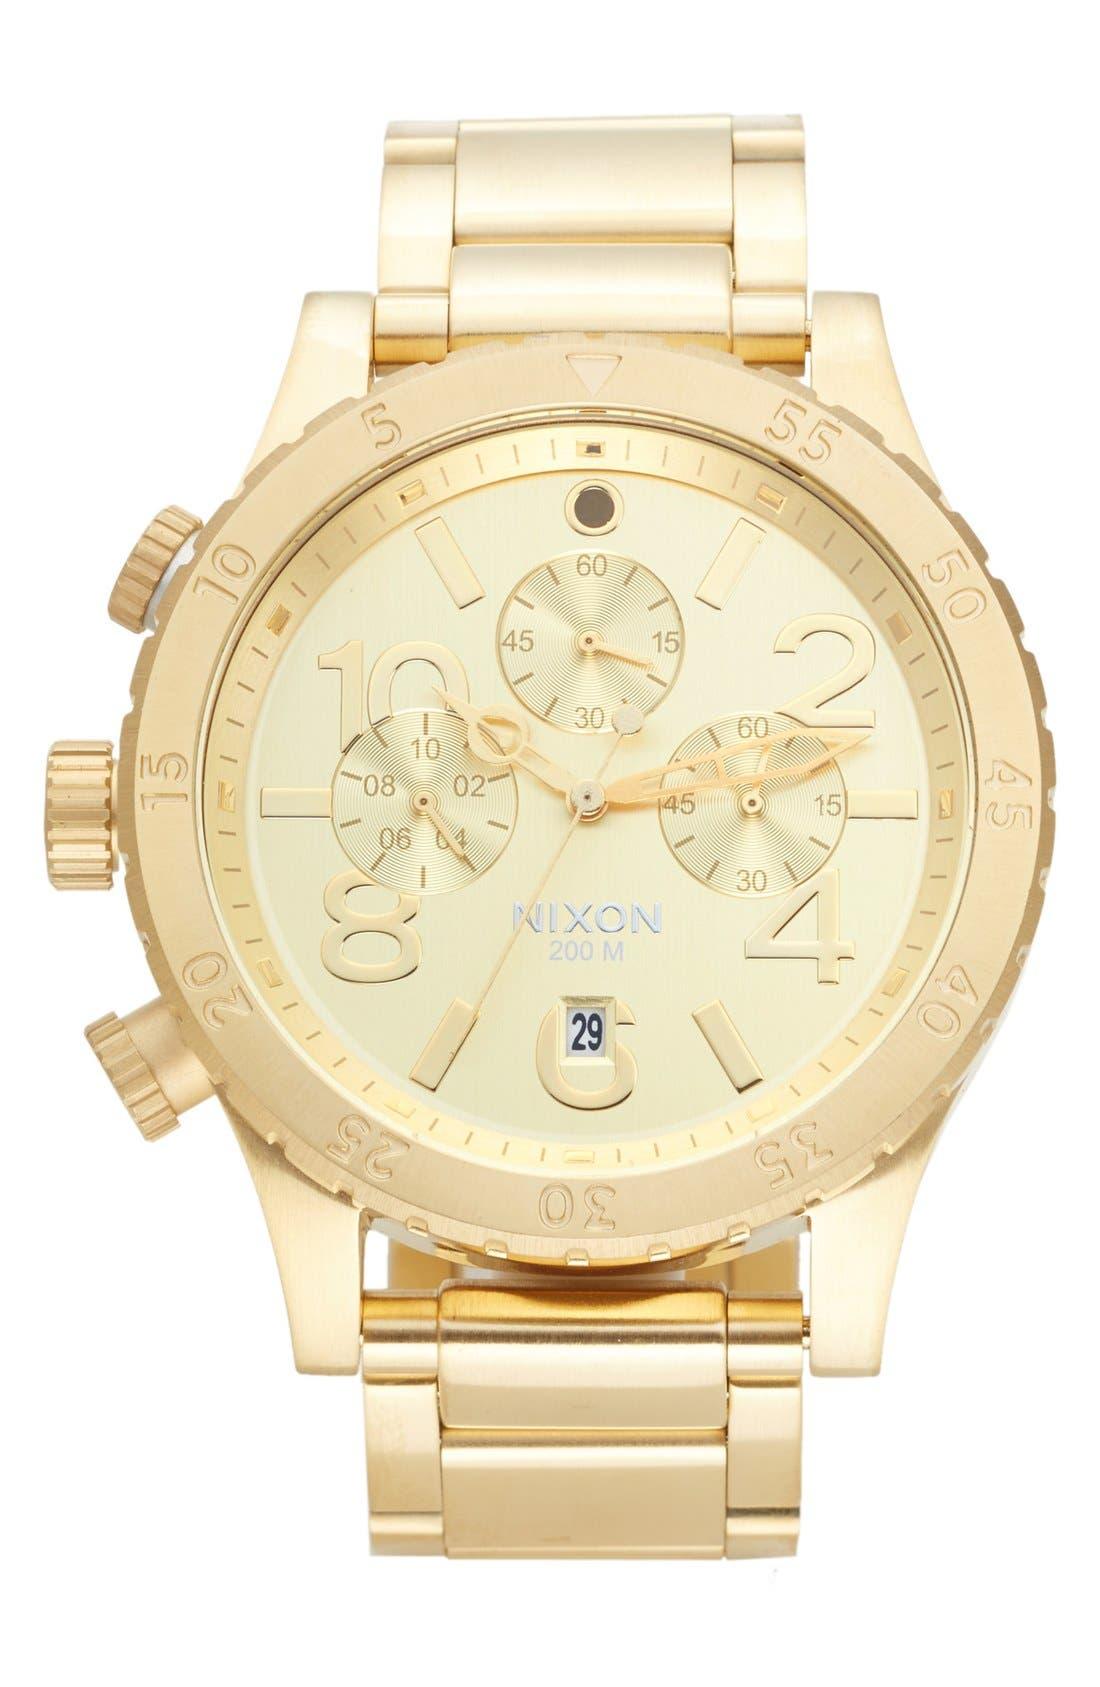 Main Image - Nixon 'The 48-20' Chronograph Watch, 48mm